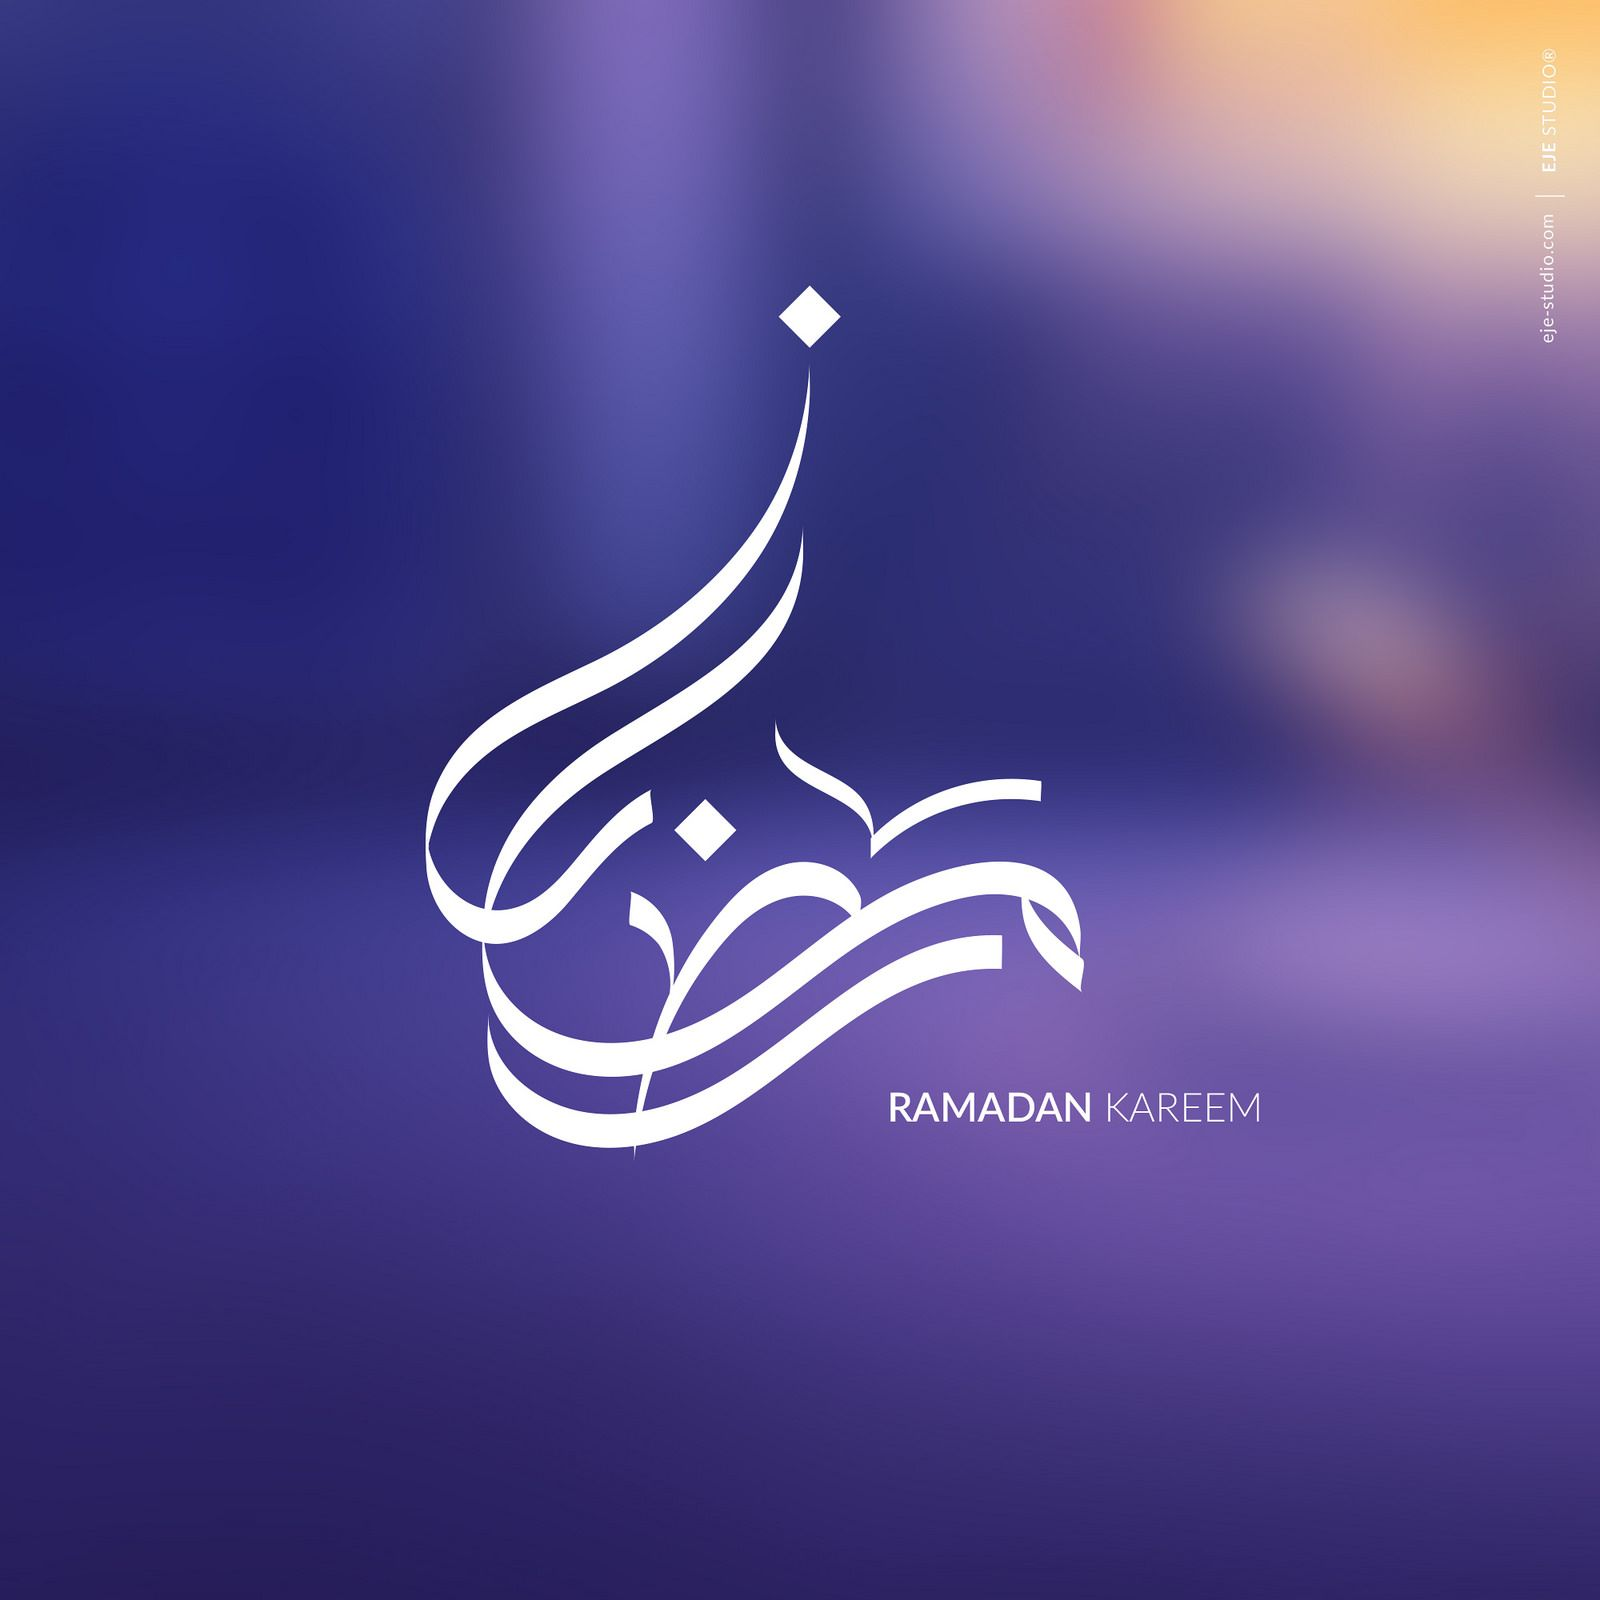 Ramadan Kareem Arabic Calligraphy By Eje Studio Ramadan Kareem Arabic Calligraphy Ramadan